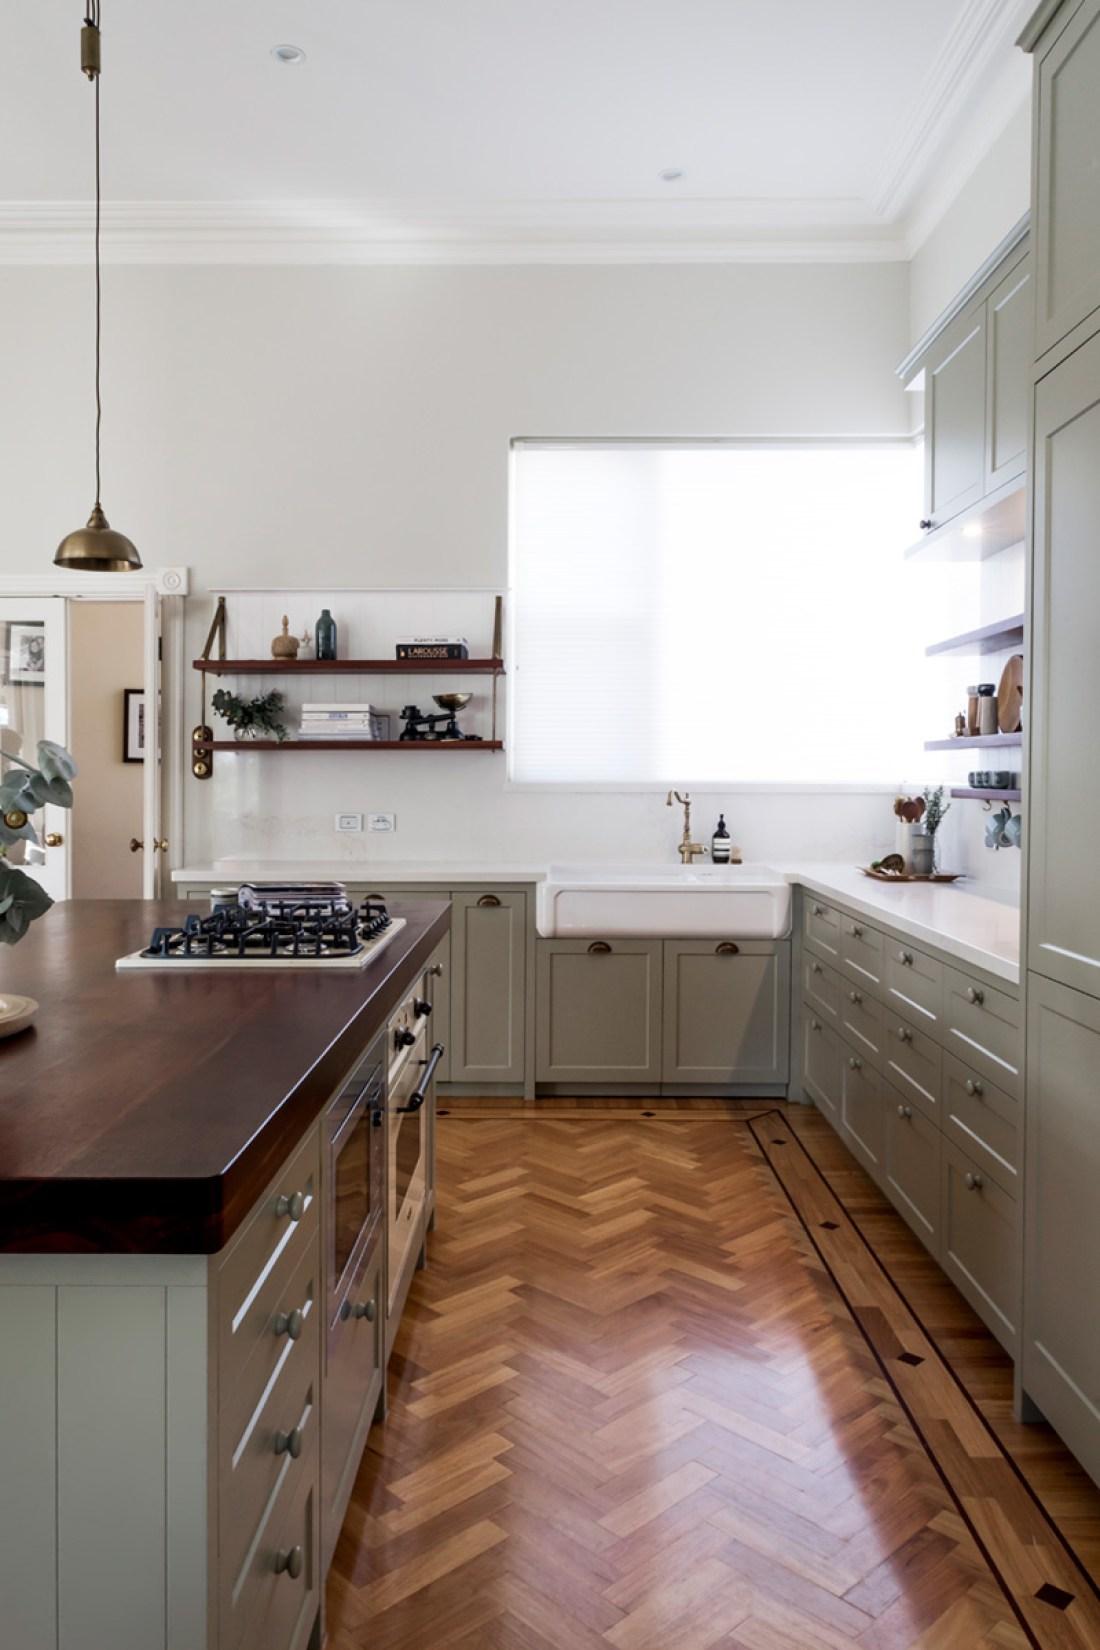 staple-design-rachael-pearse-house-nerd-shaker-kitchen-renovation-subiaco-green-kitchen-reno-traditional-herringbone-parquetry-floors-custom-made-cabinetry-perth